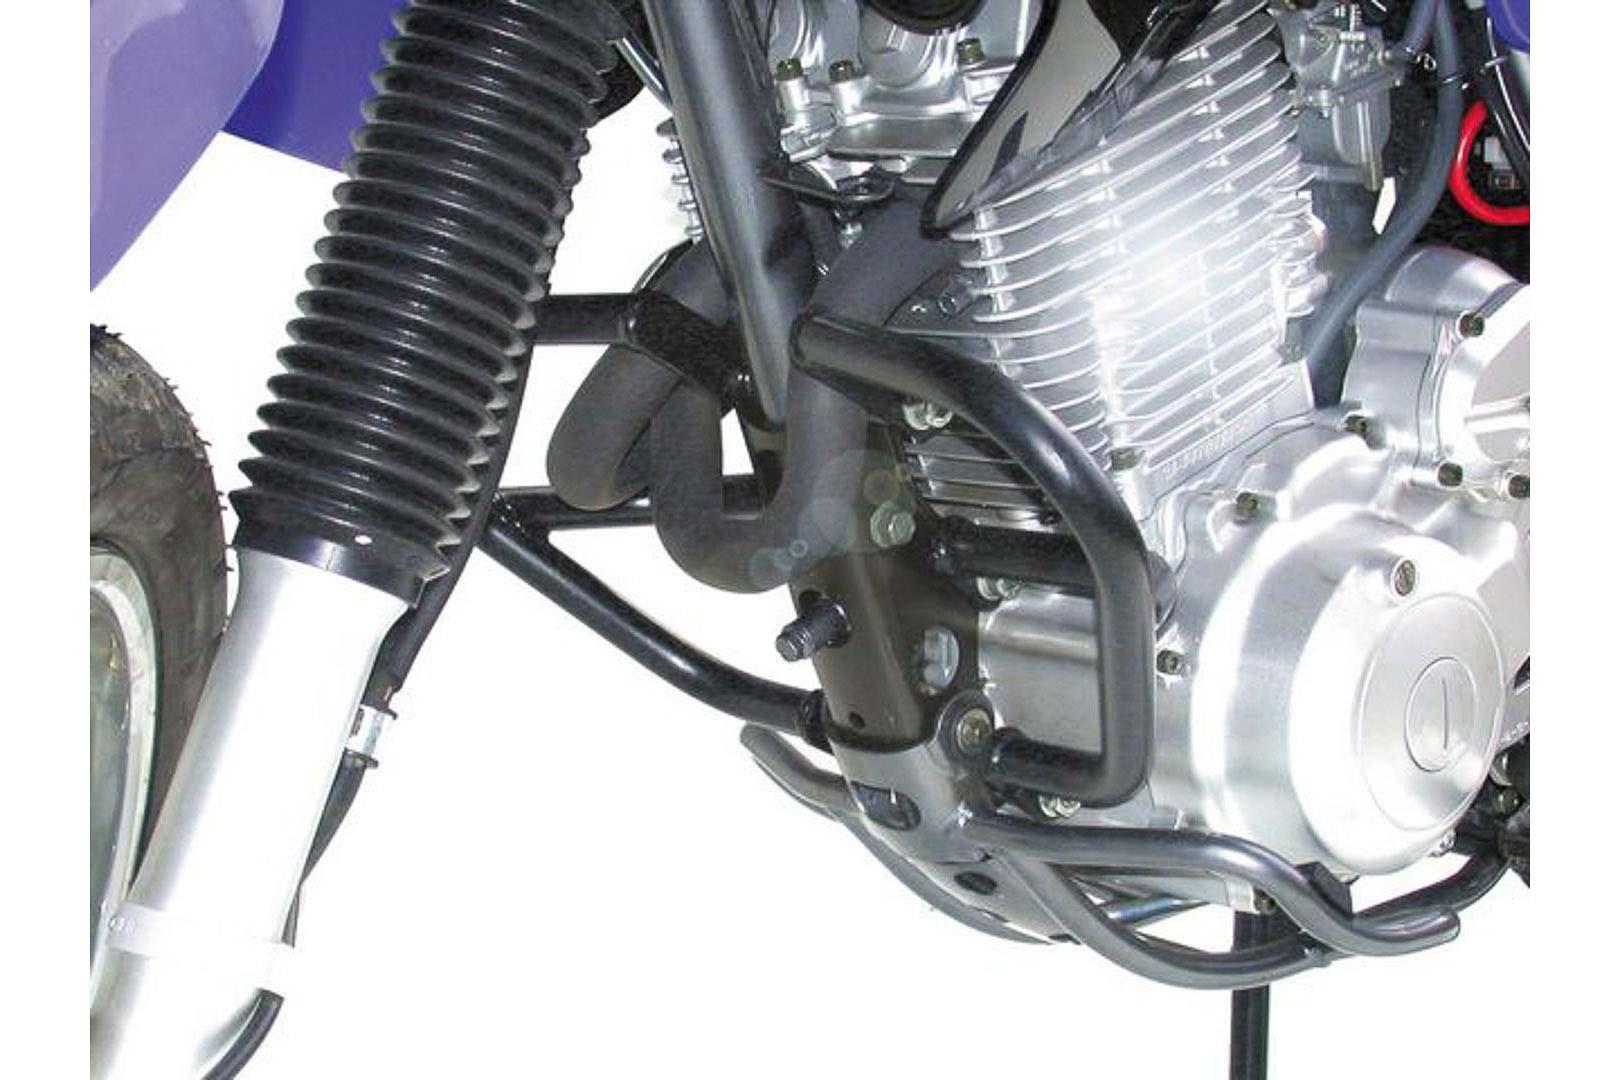 SW-Motech Moottorinsuojarauta Yamaha XT600 93- musta